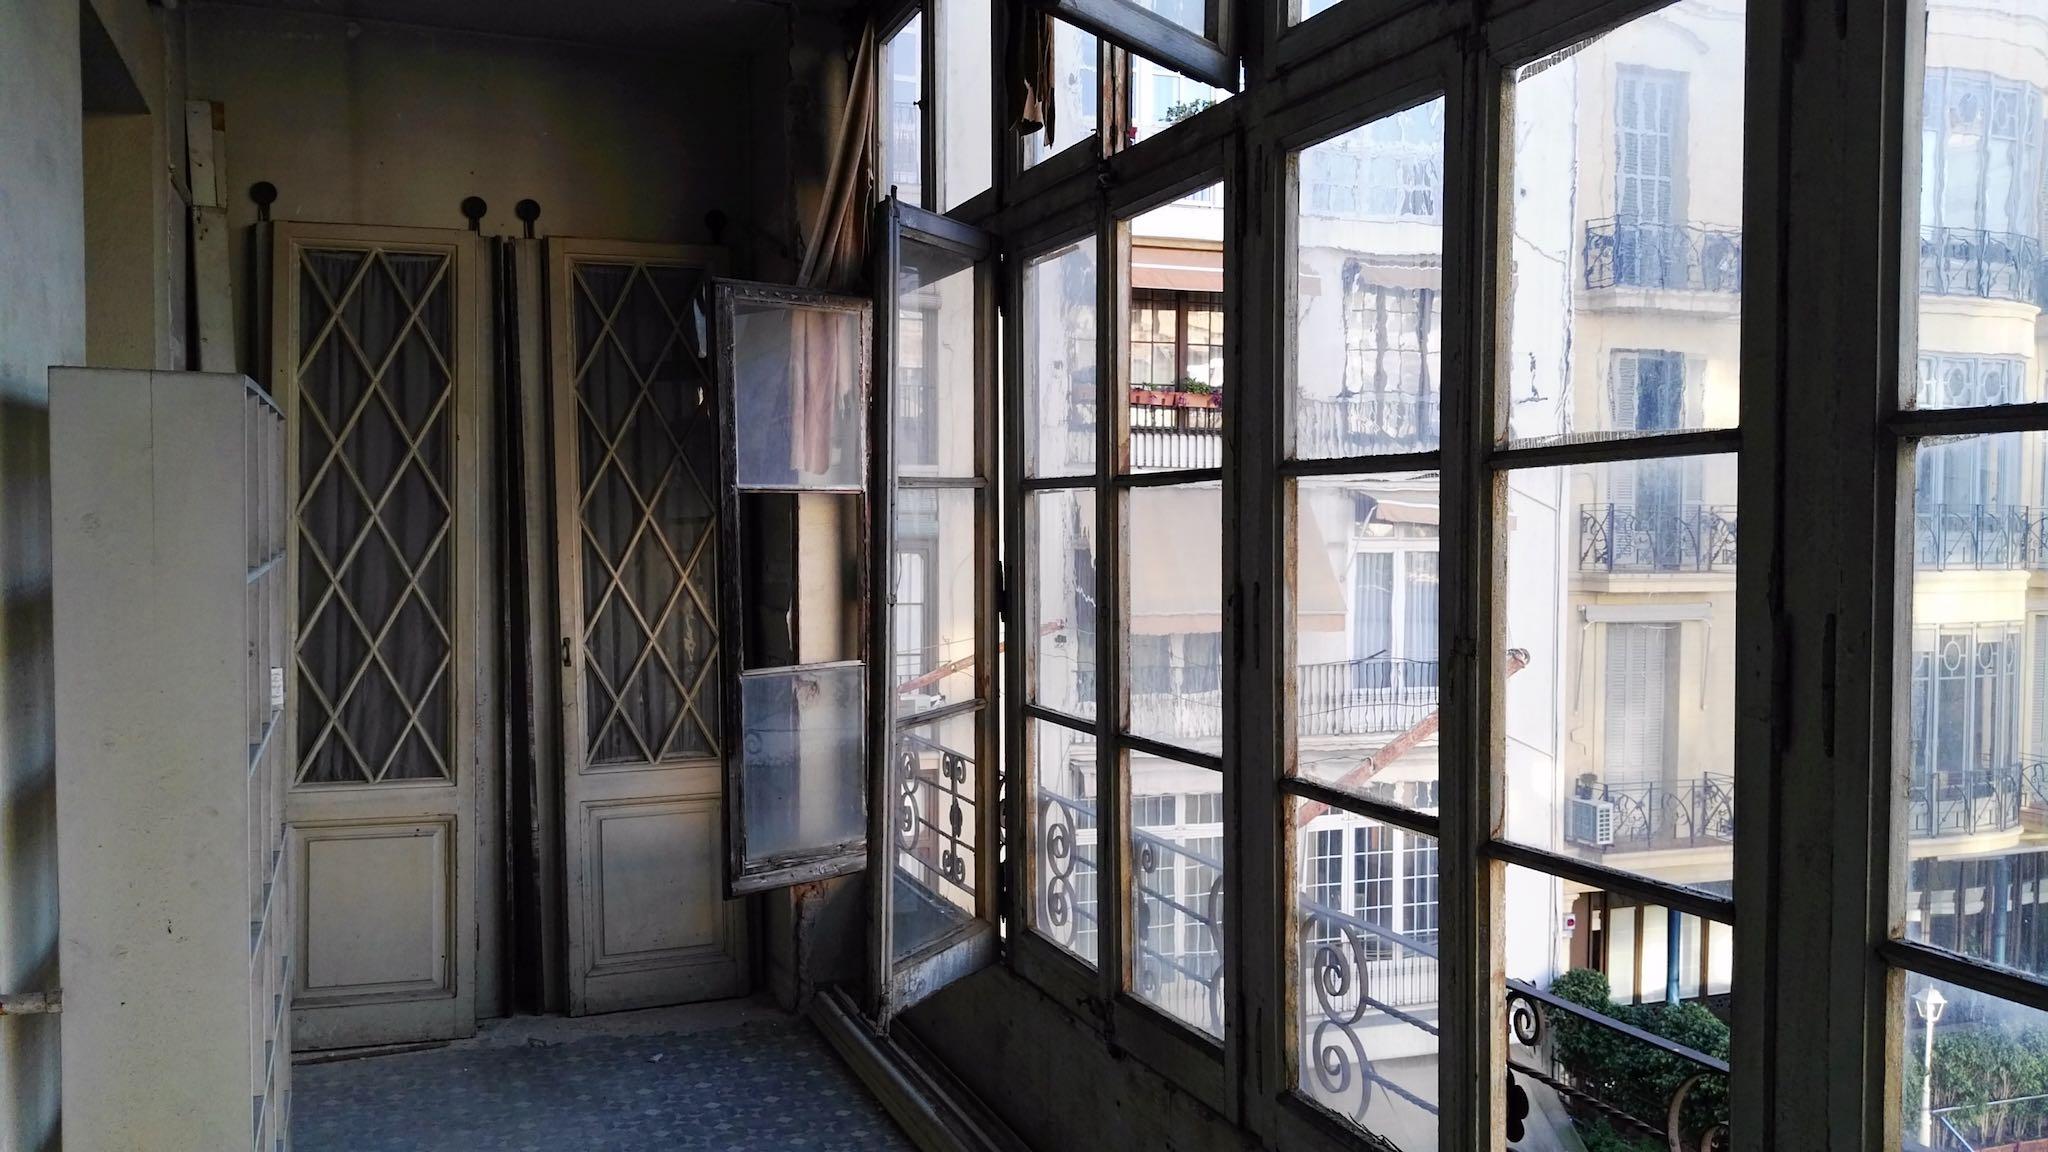 Barcelona apartment renovation and refurbishment case study project